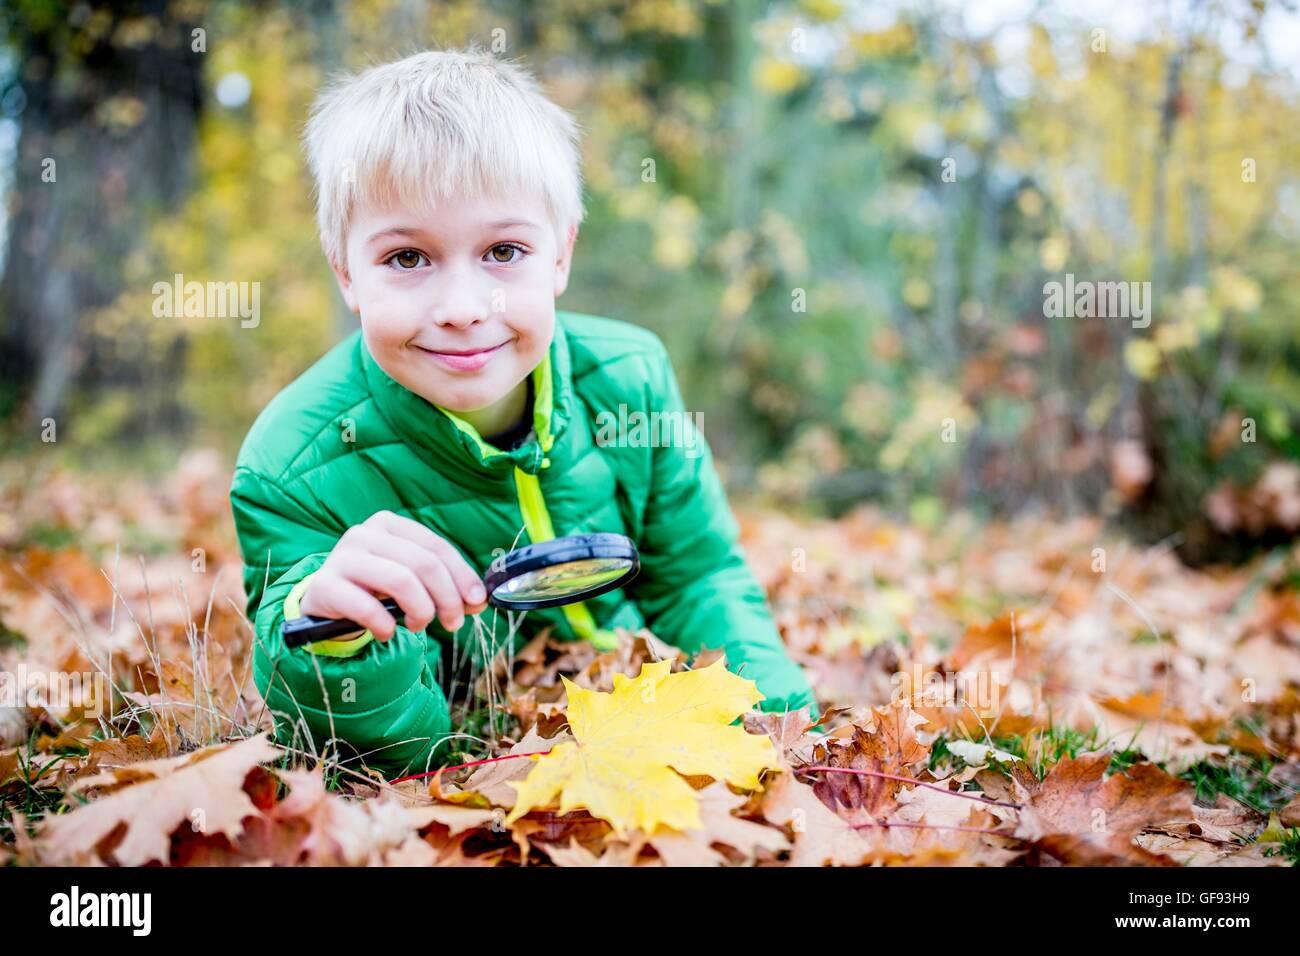 MODEL RELEASED. Boy holding magnifying glass over autumn leaf, smiling, portrait. - Stock Image